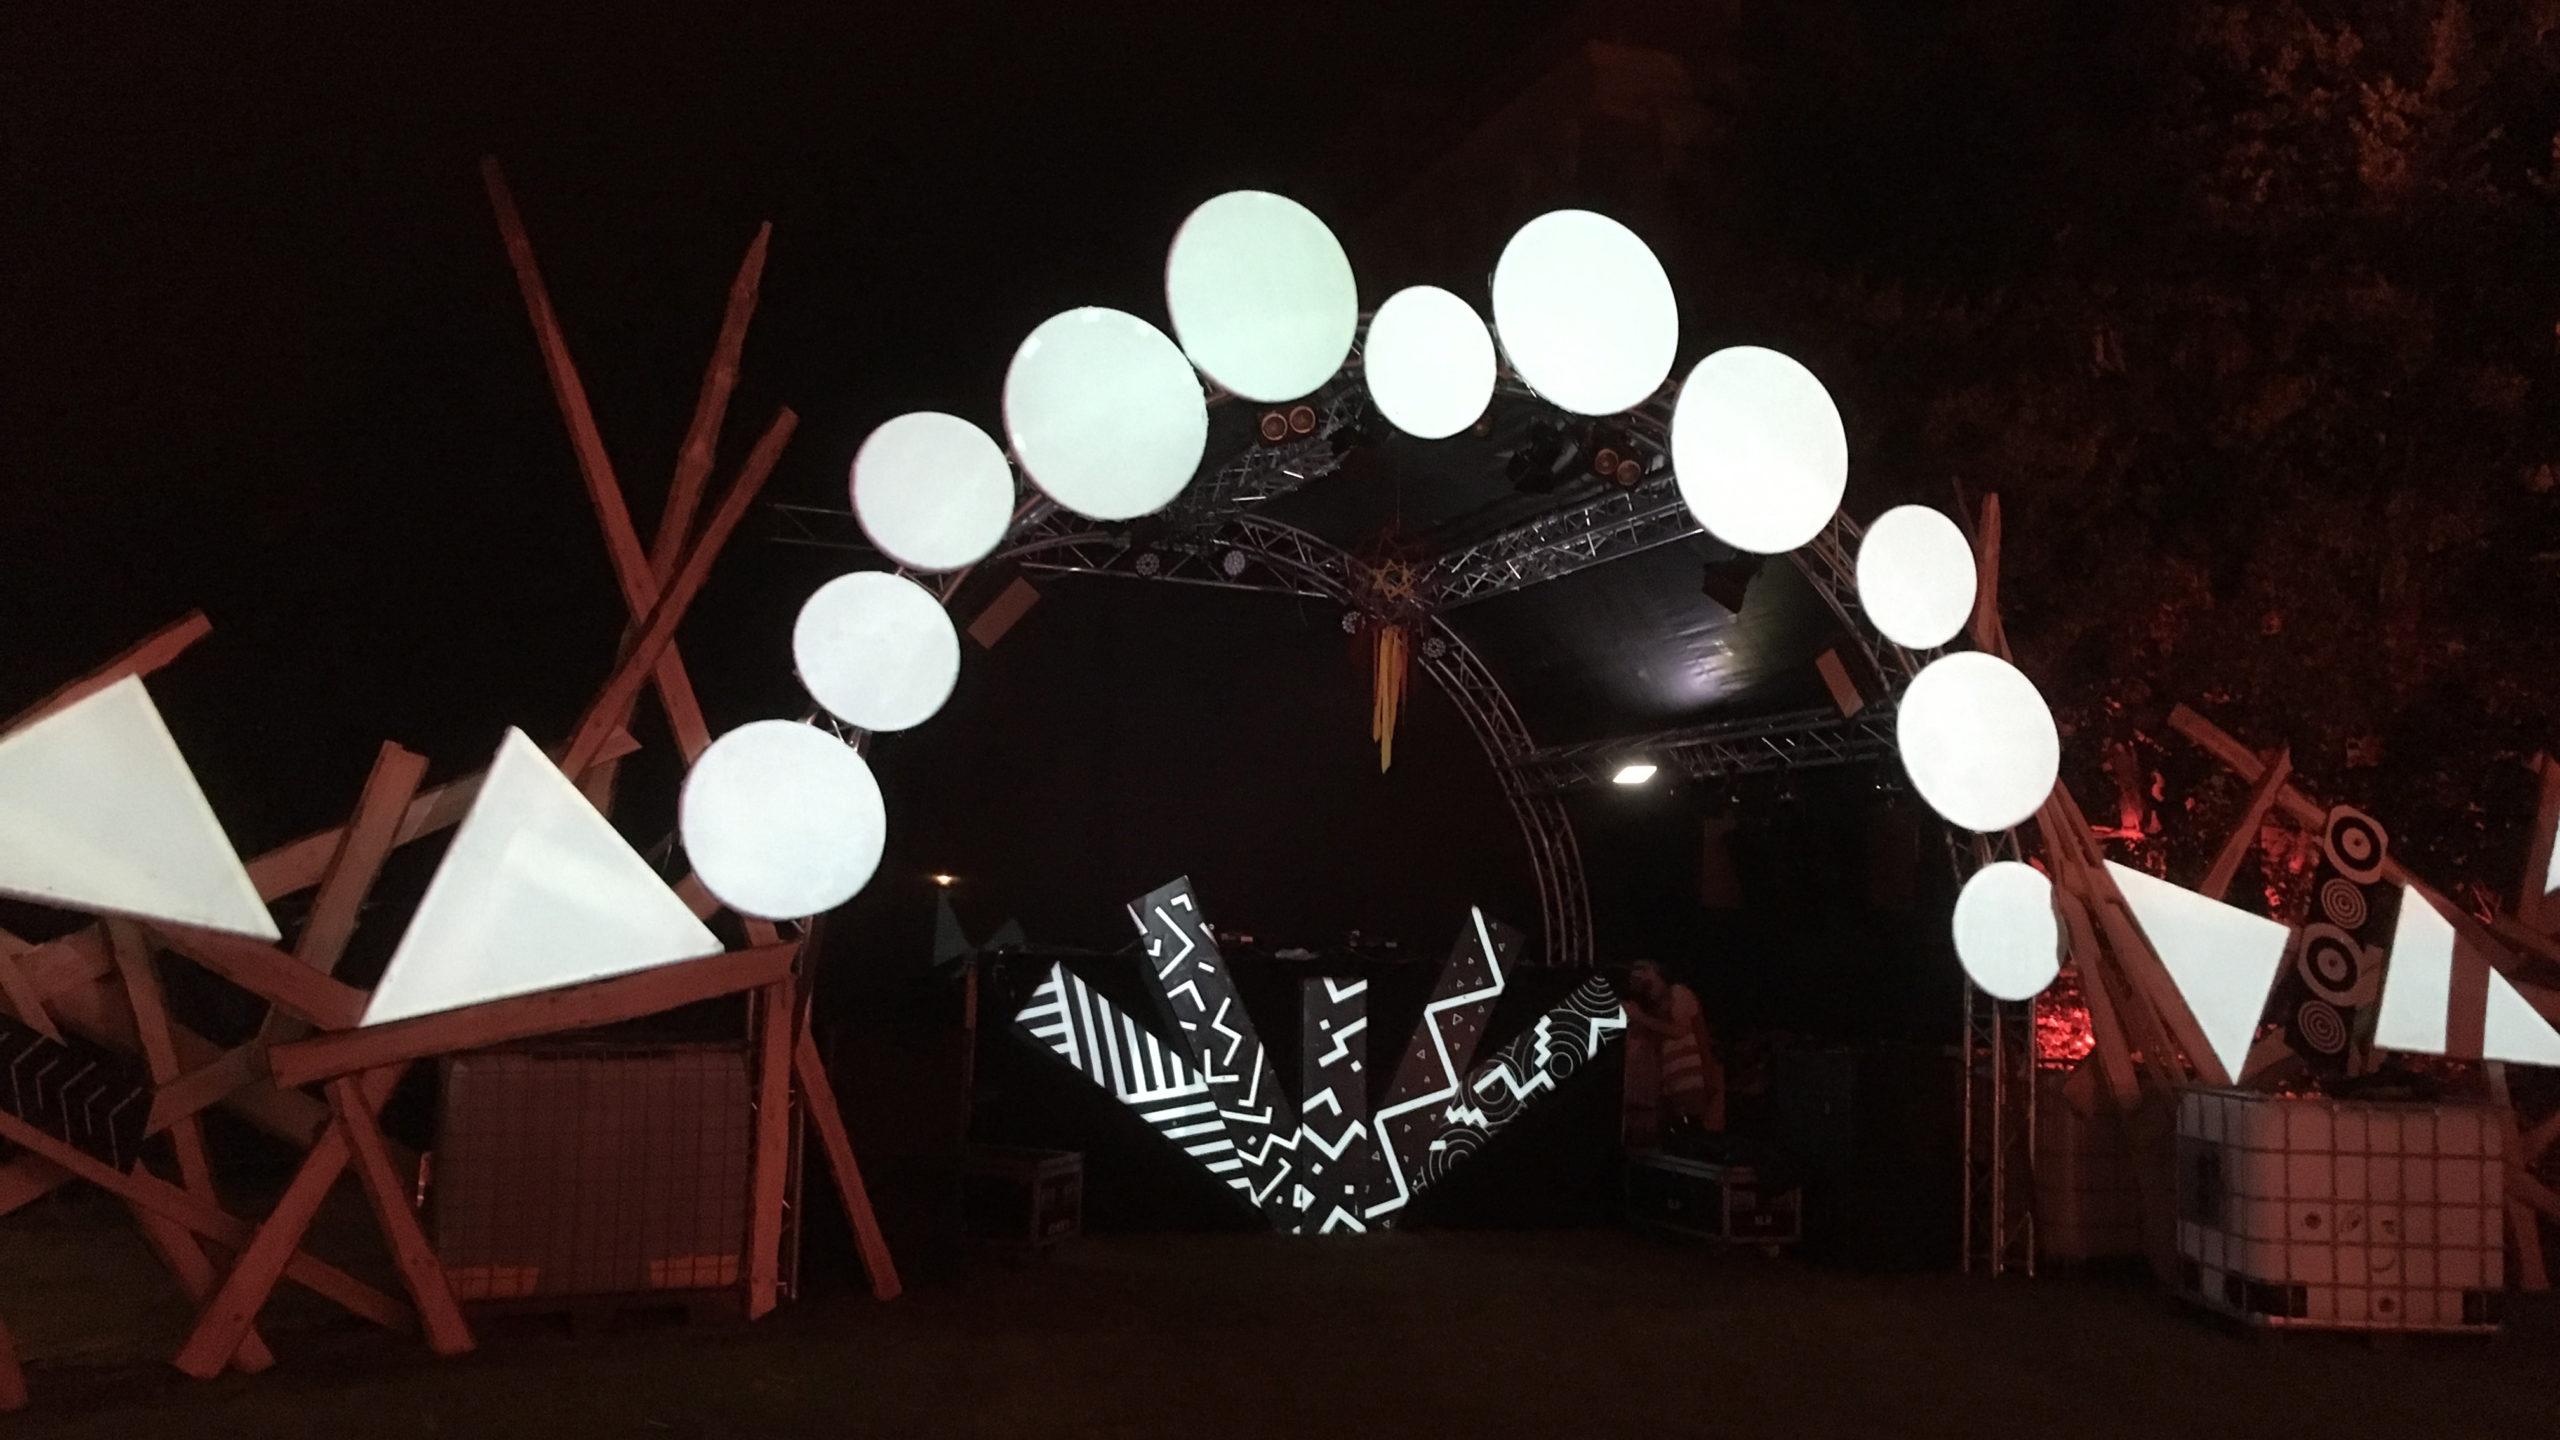 Taktraumfestival Bühne 2018